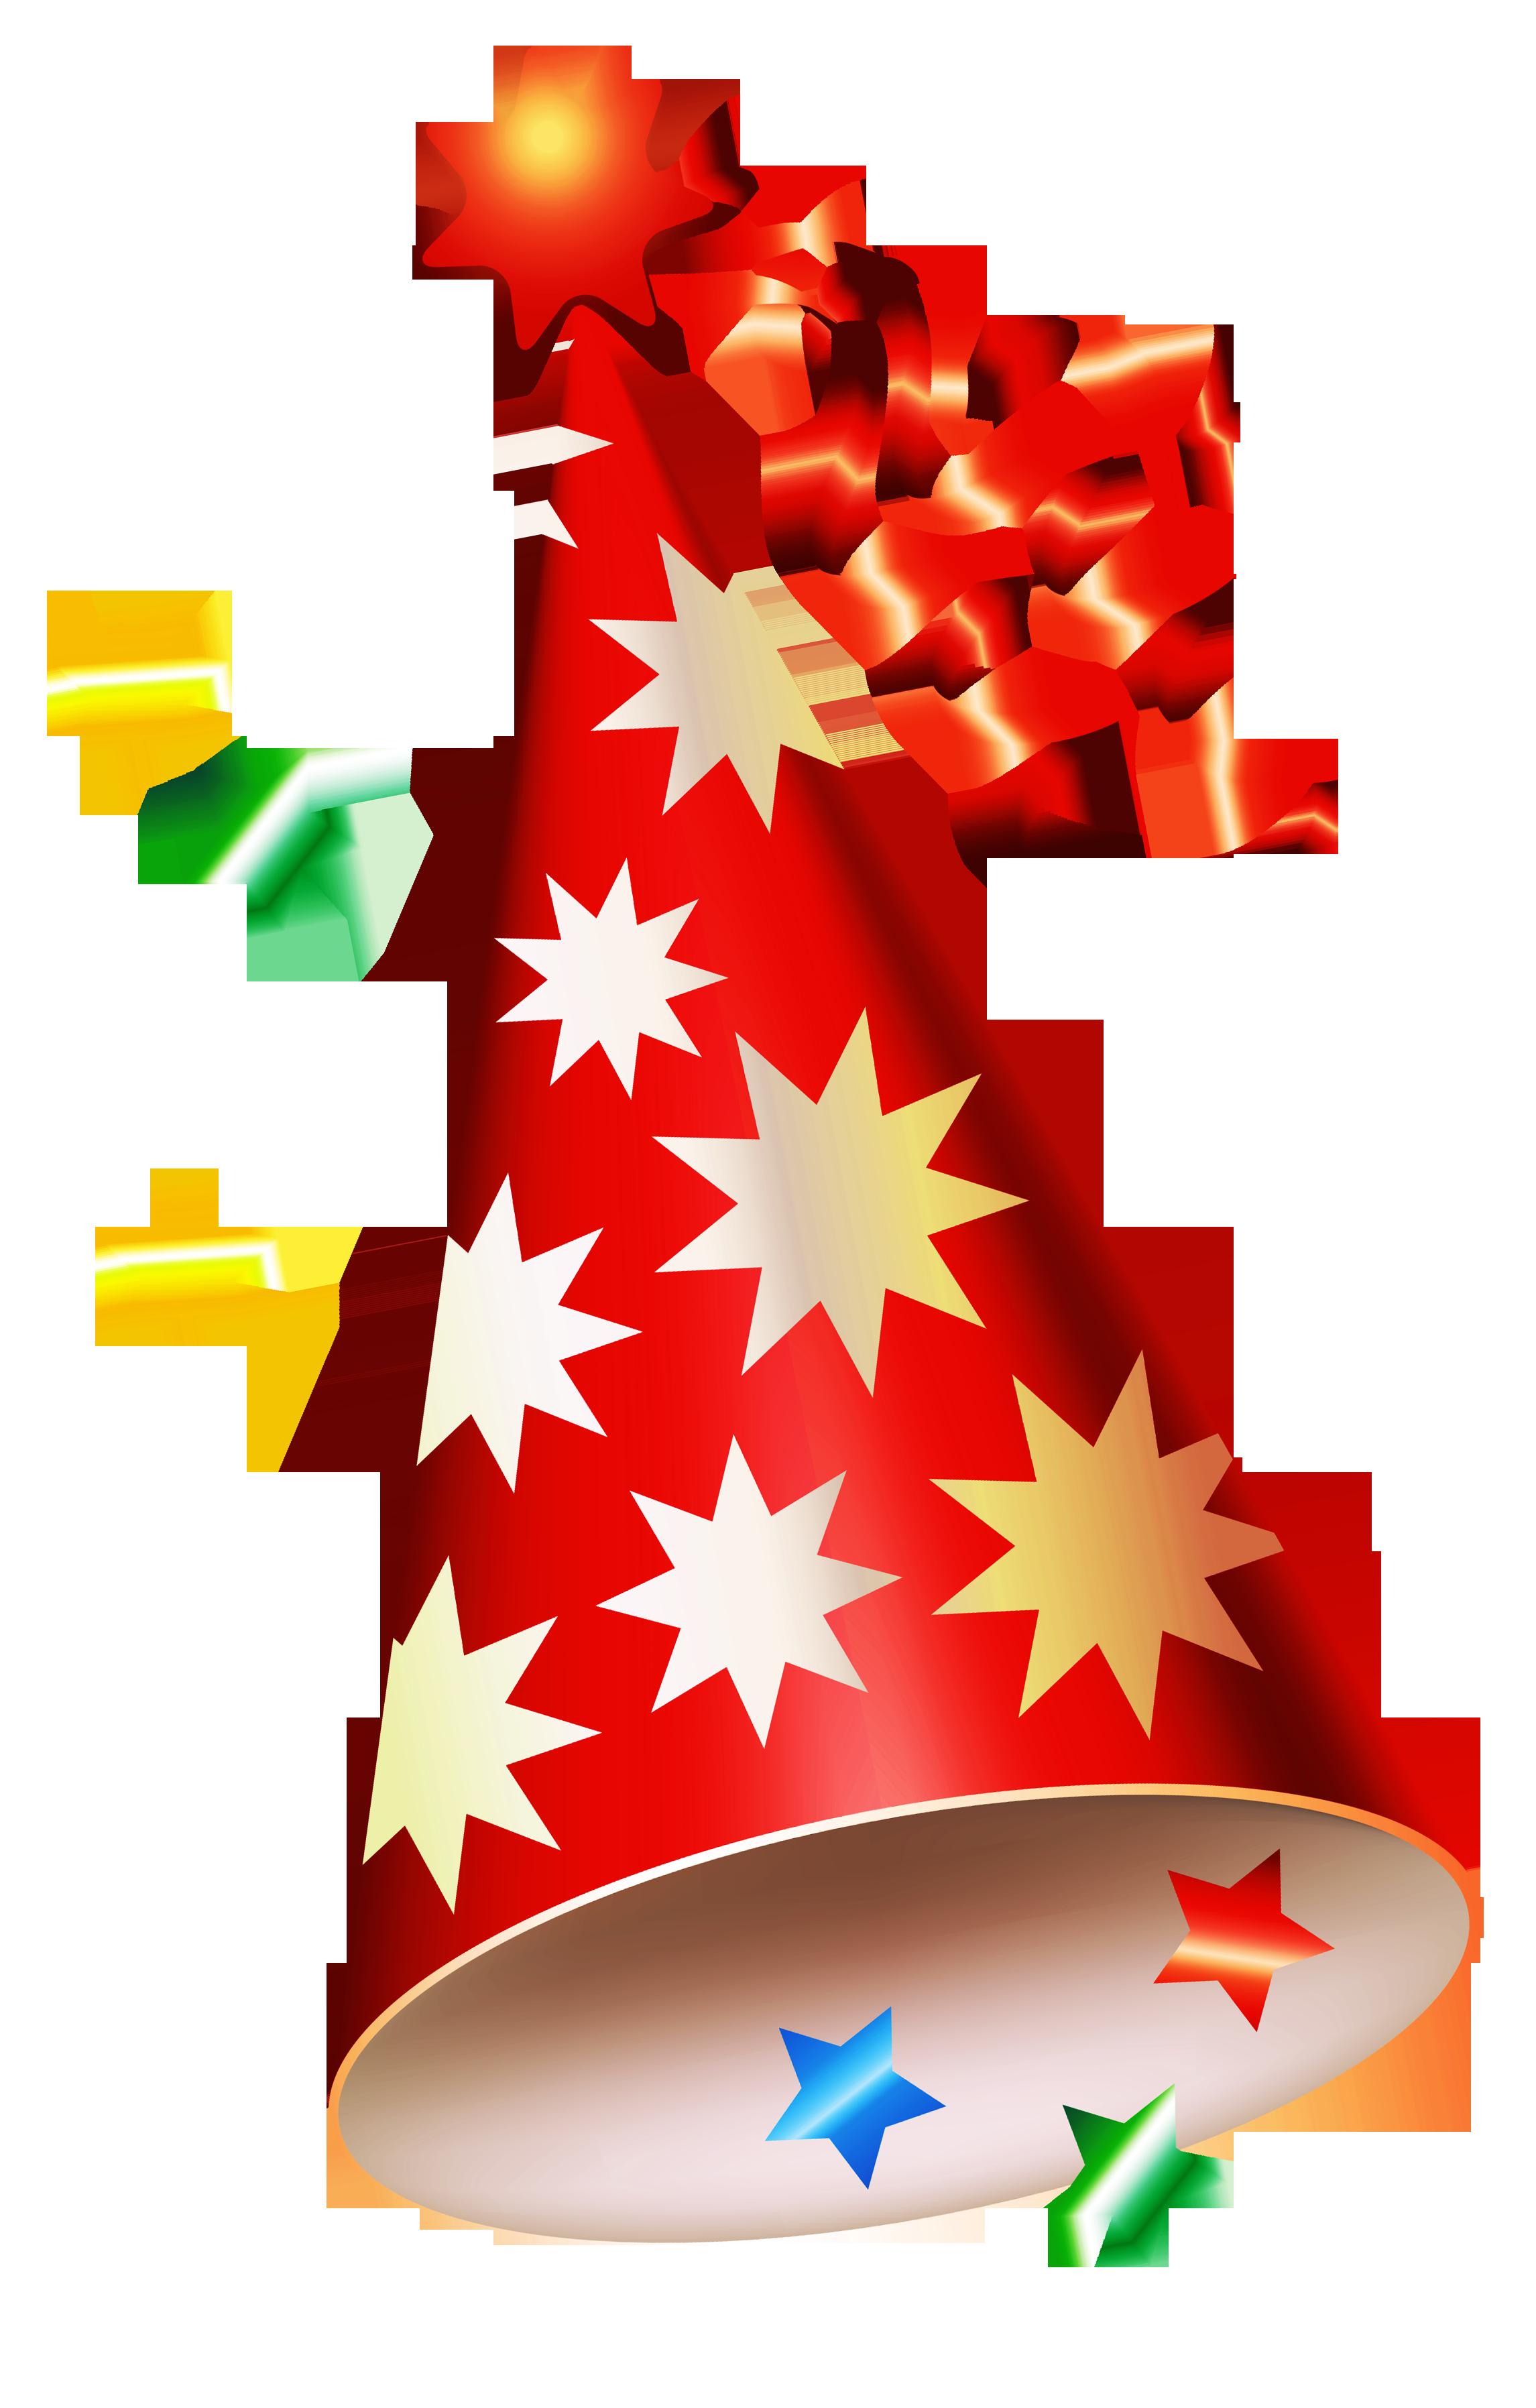 Birthday star clipart jpg freeuse download happy birthday png | Happy Birthday Hat Png Gallery For Birthday Hat ... jpg freeuse download